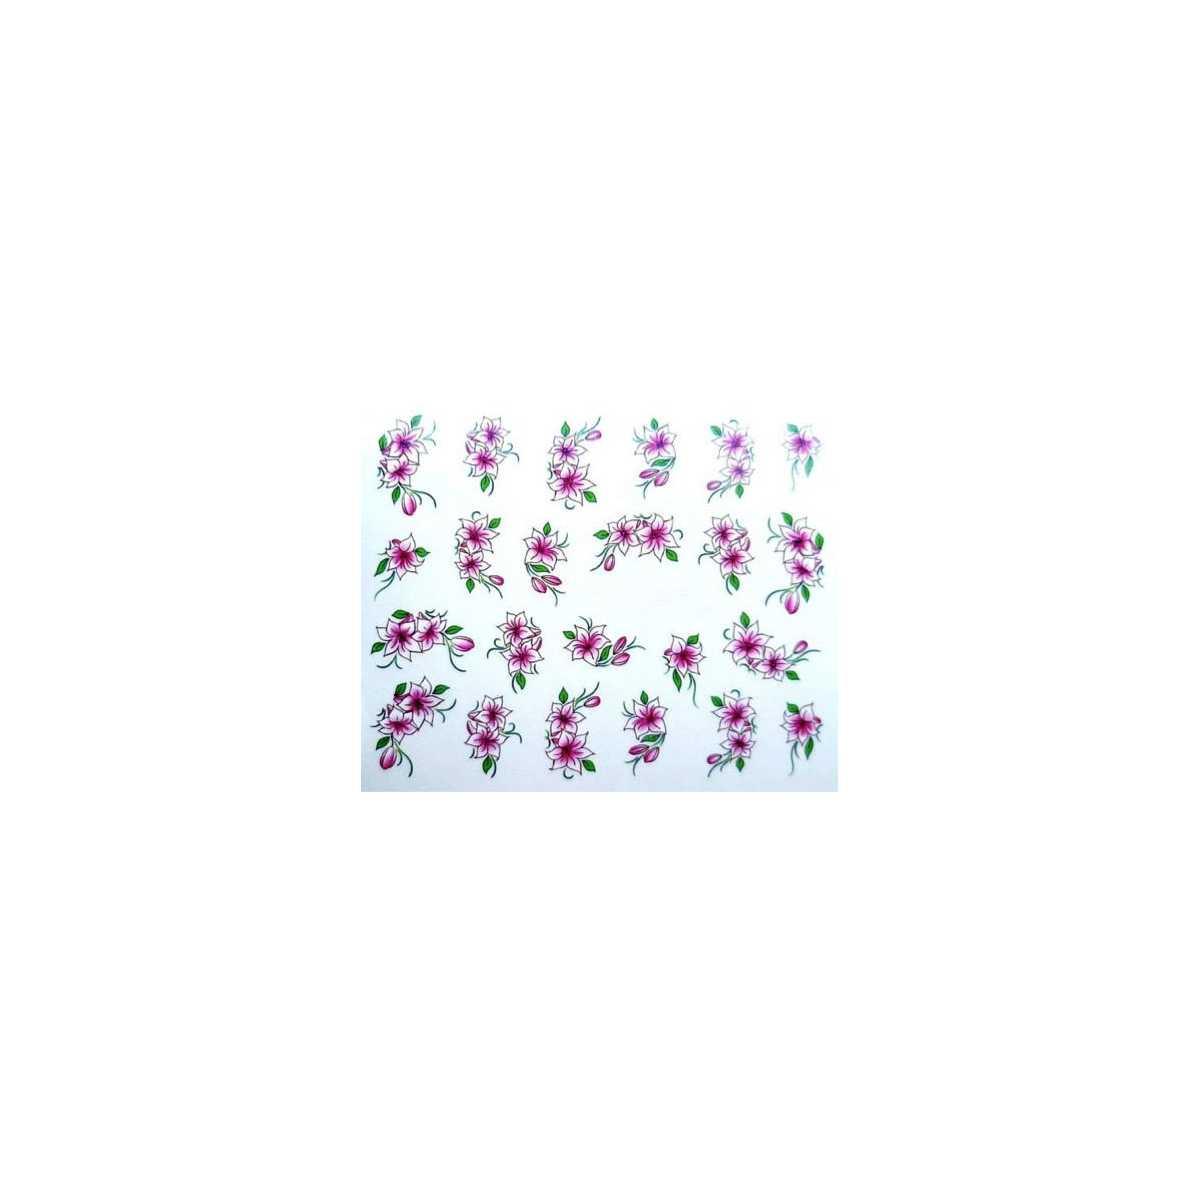 Water Decals Fleurs De Lys Blanc Et Rose